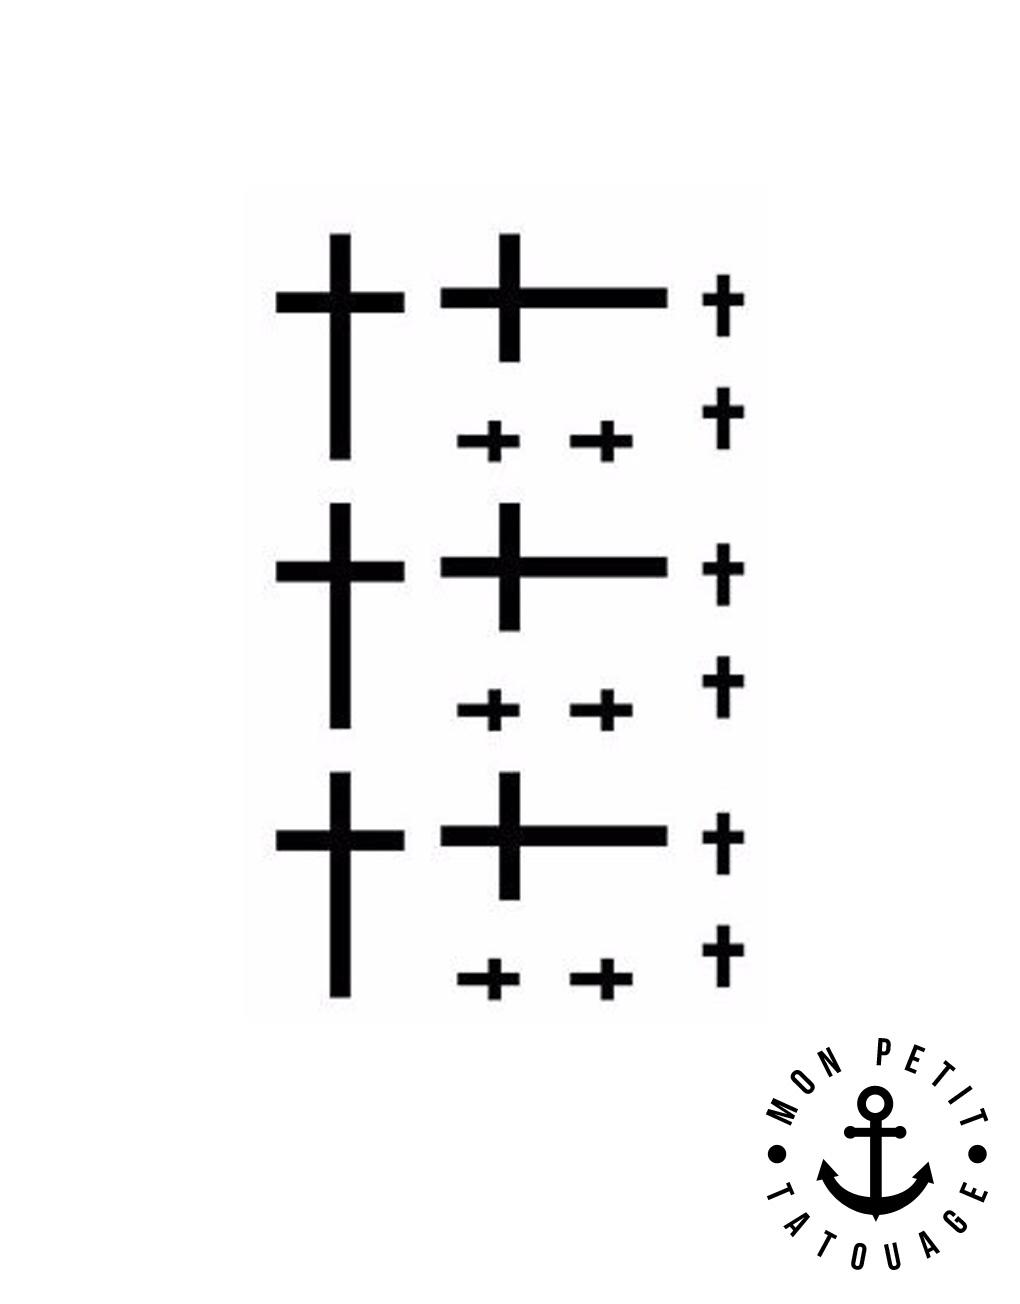 petit tatouage croix ph m re mon petit tatouage temporaire. Black Bedroom Furniture Sets. Home Design Ideas